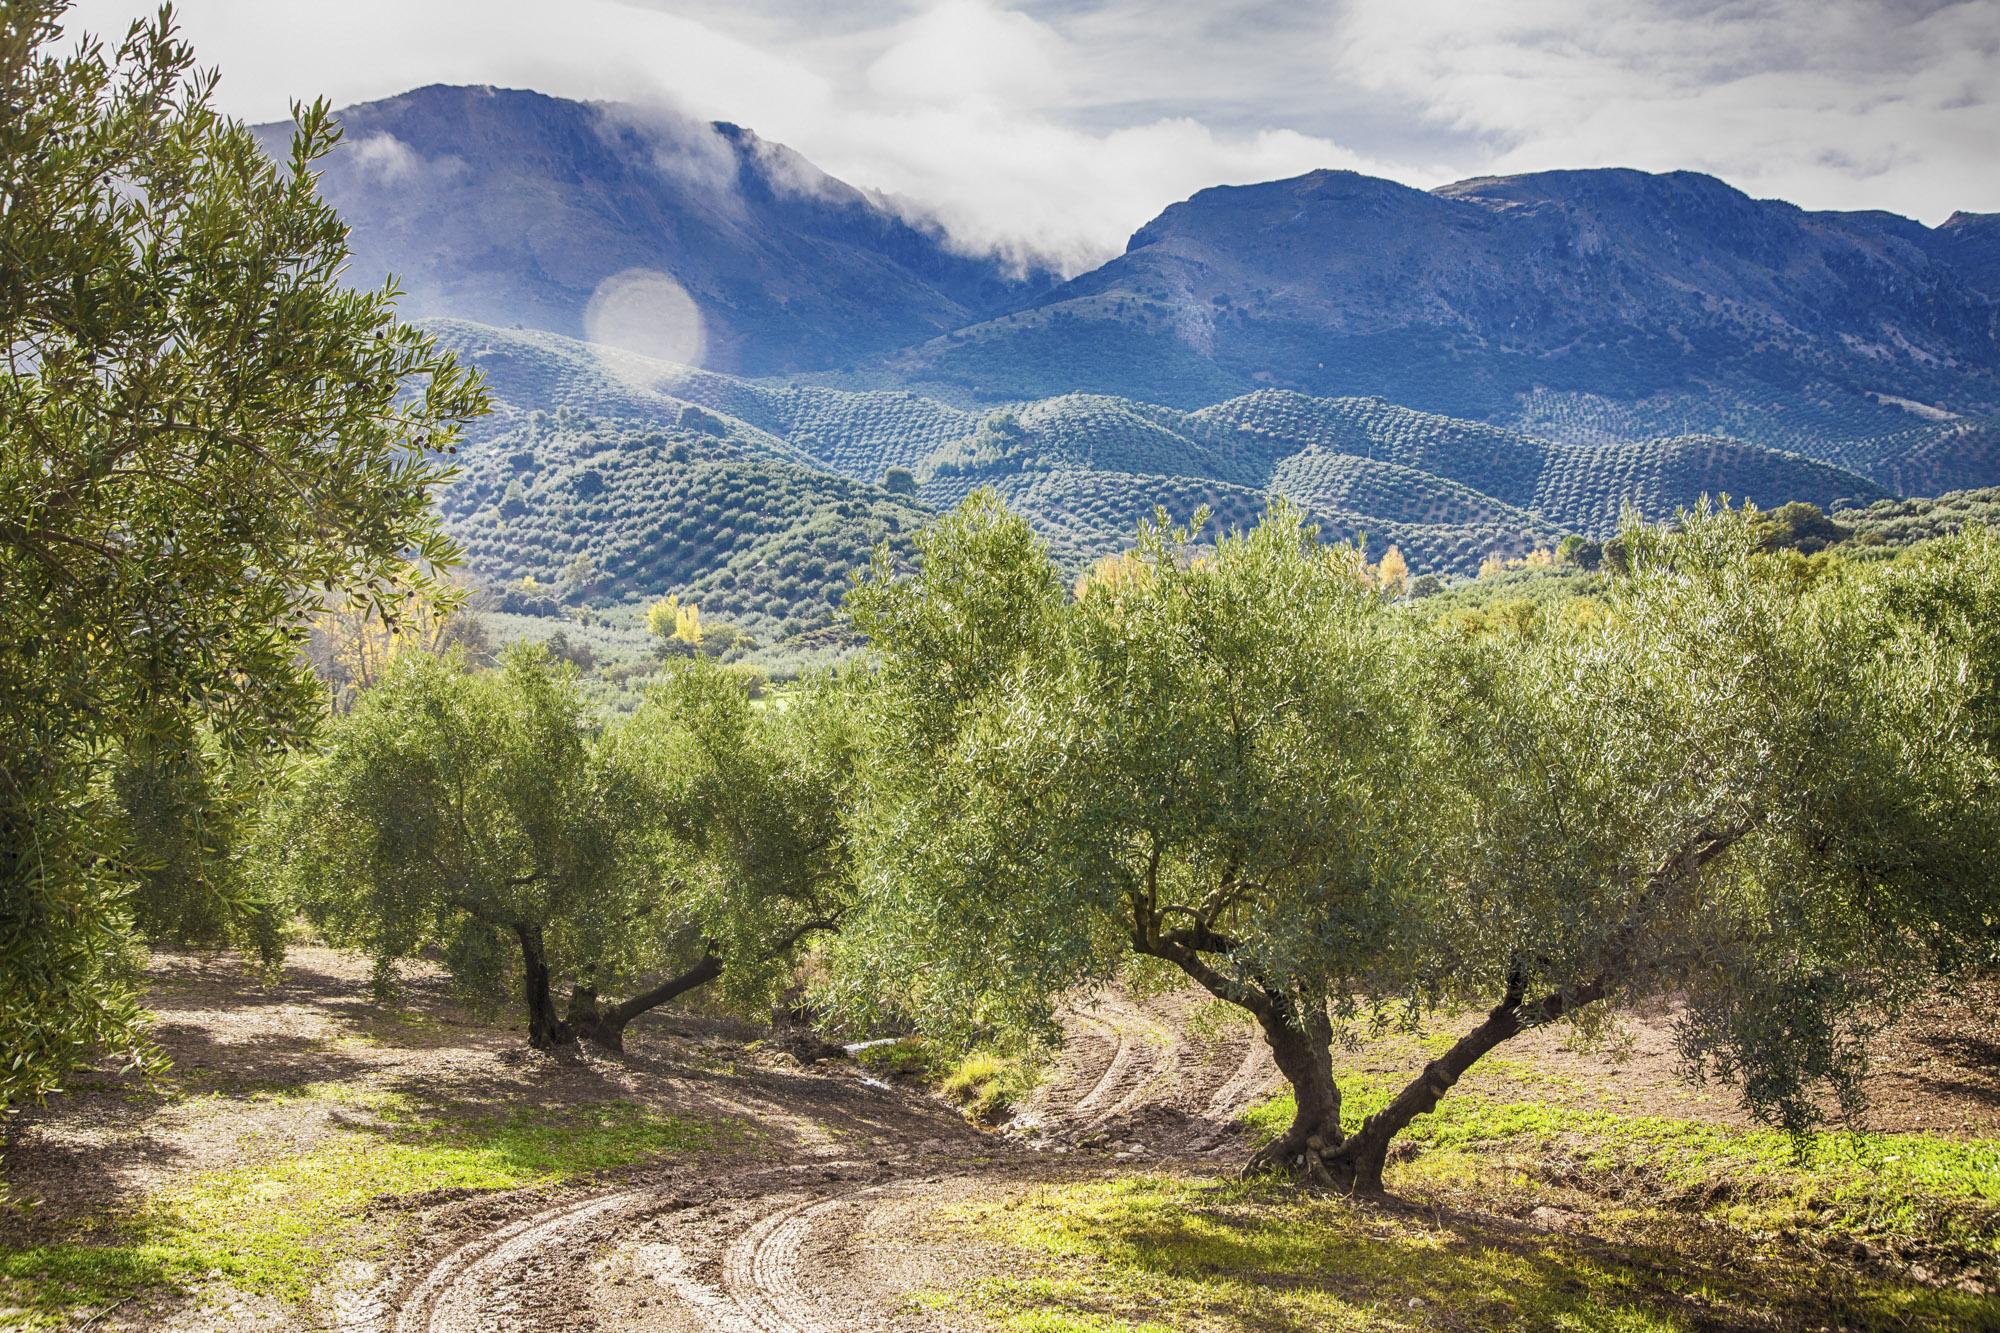 Spanien Andalusien, Provinz Cordoba, Priego de Cordoba. Olivenhain